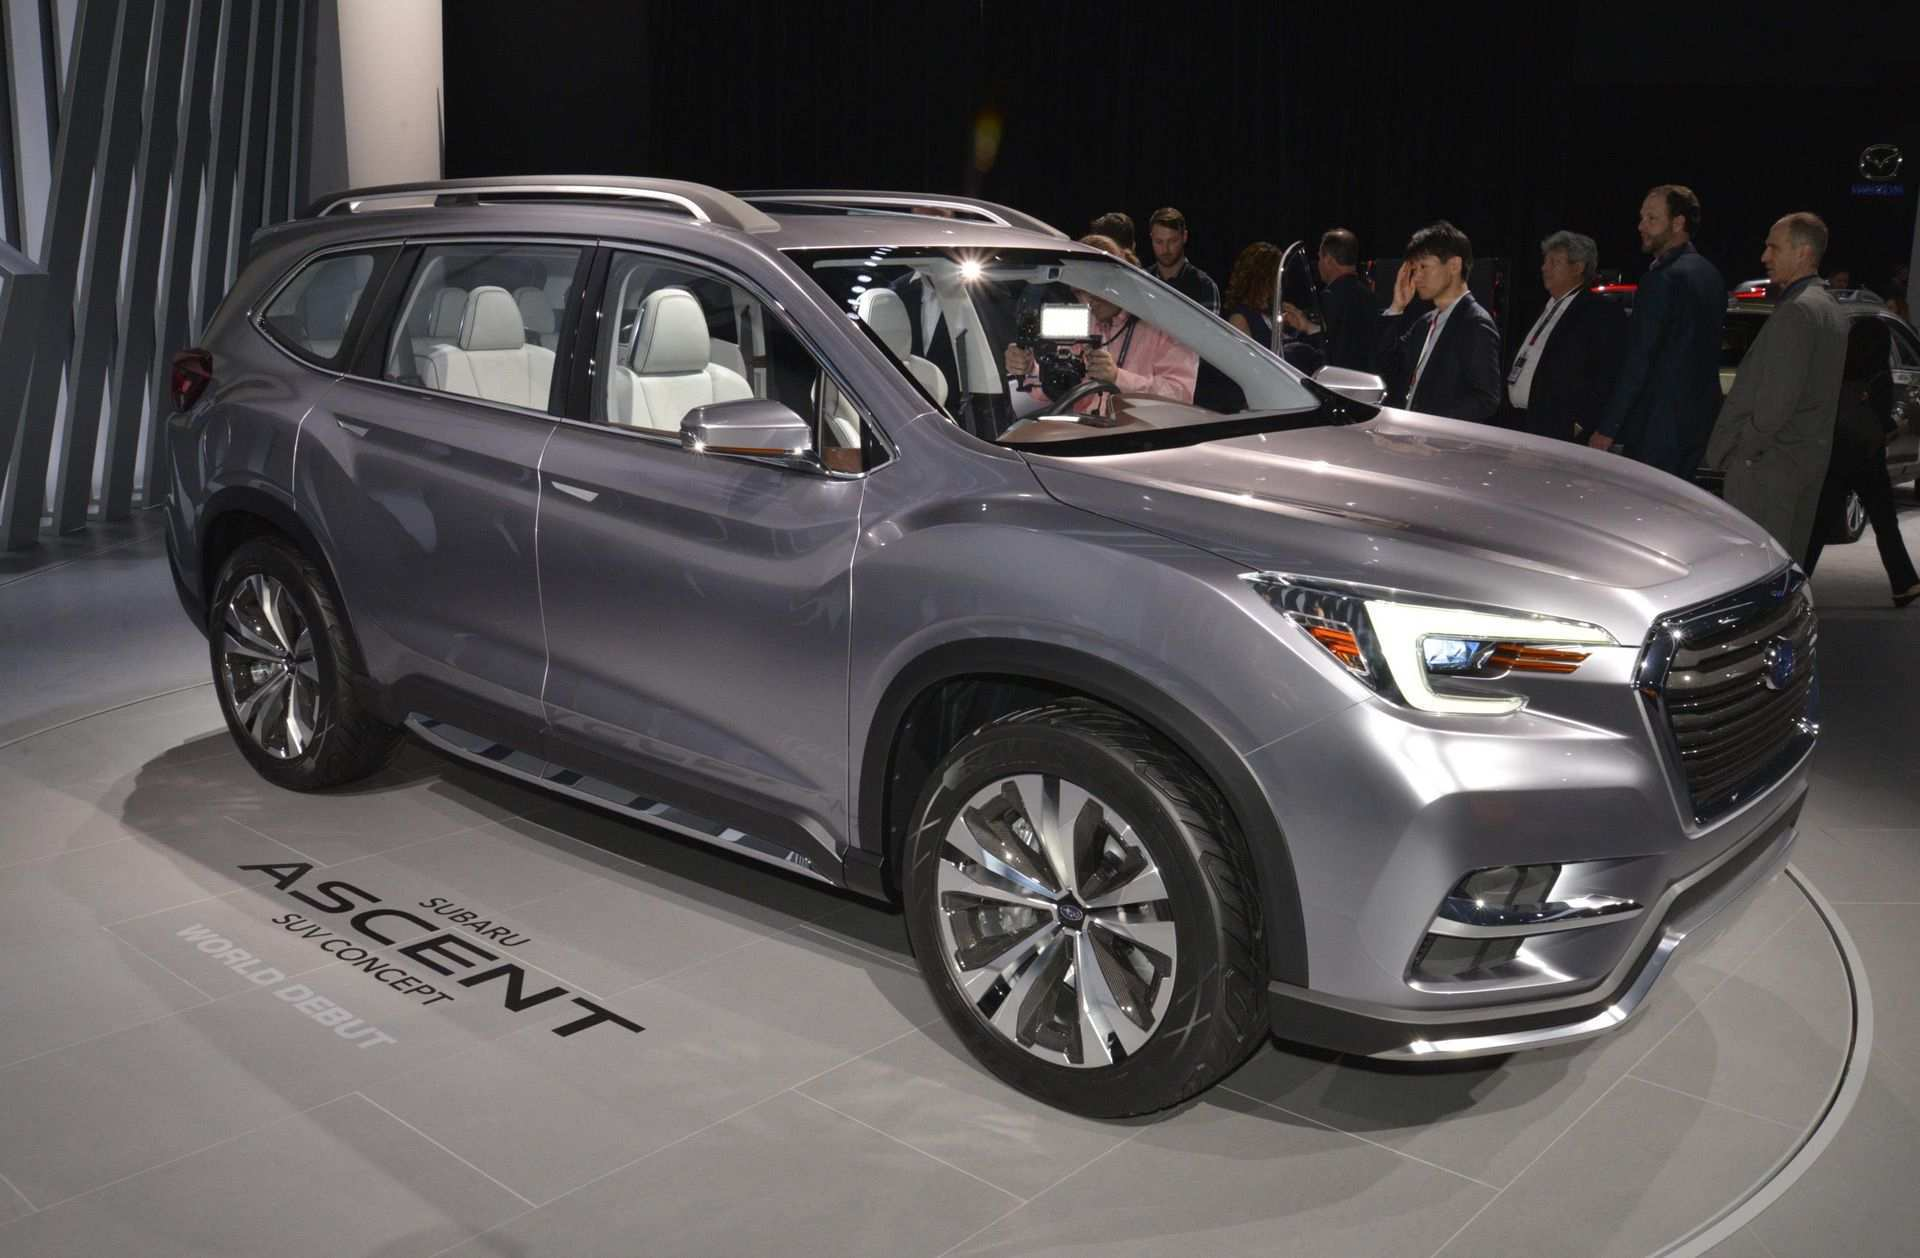 69 All New Subaru Exterior 2020 Style with Subaru Exterior 2020